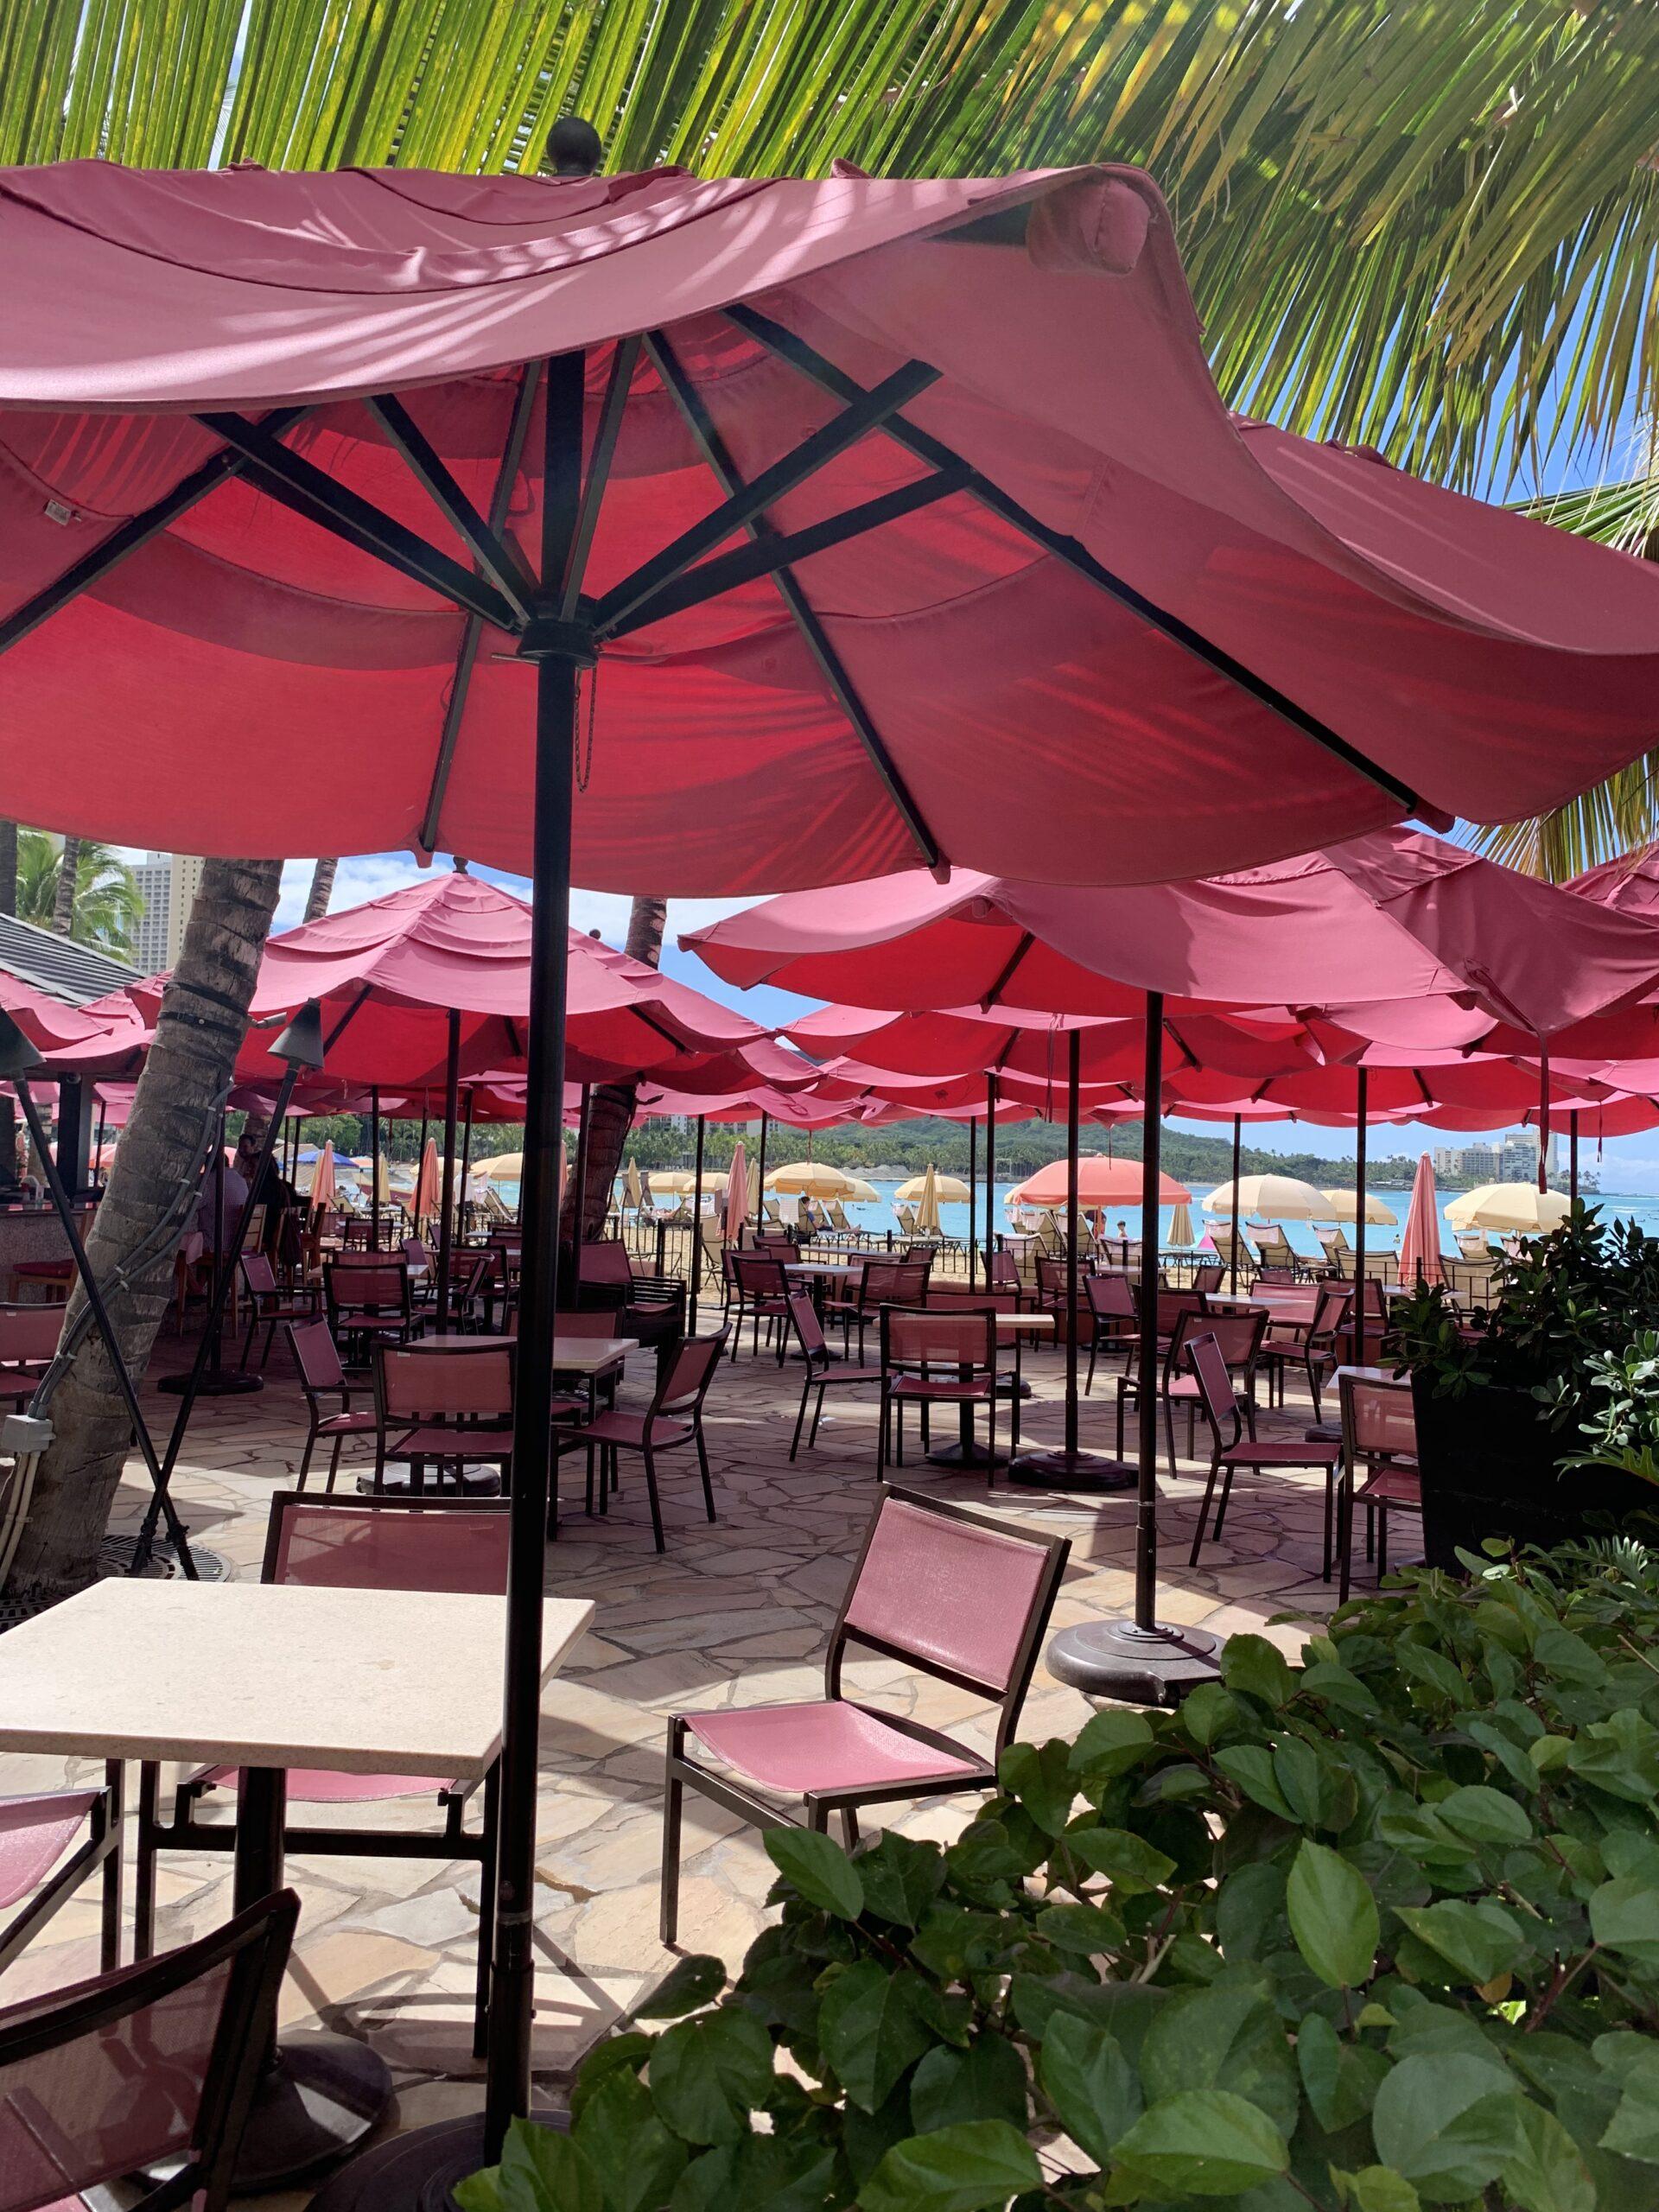 Pink umbrellas on the beach